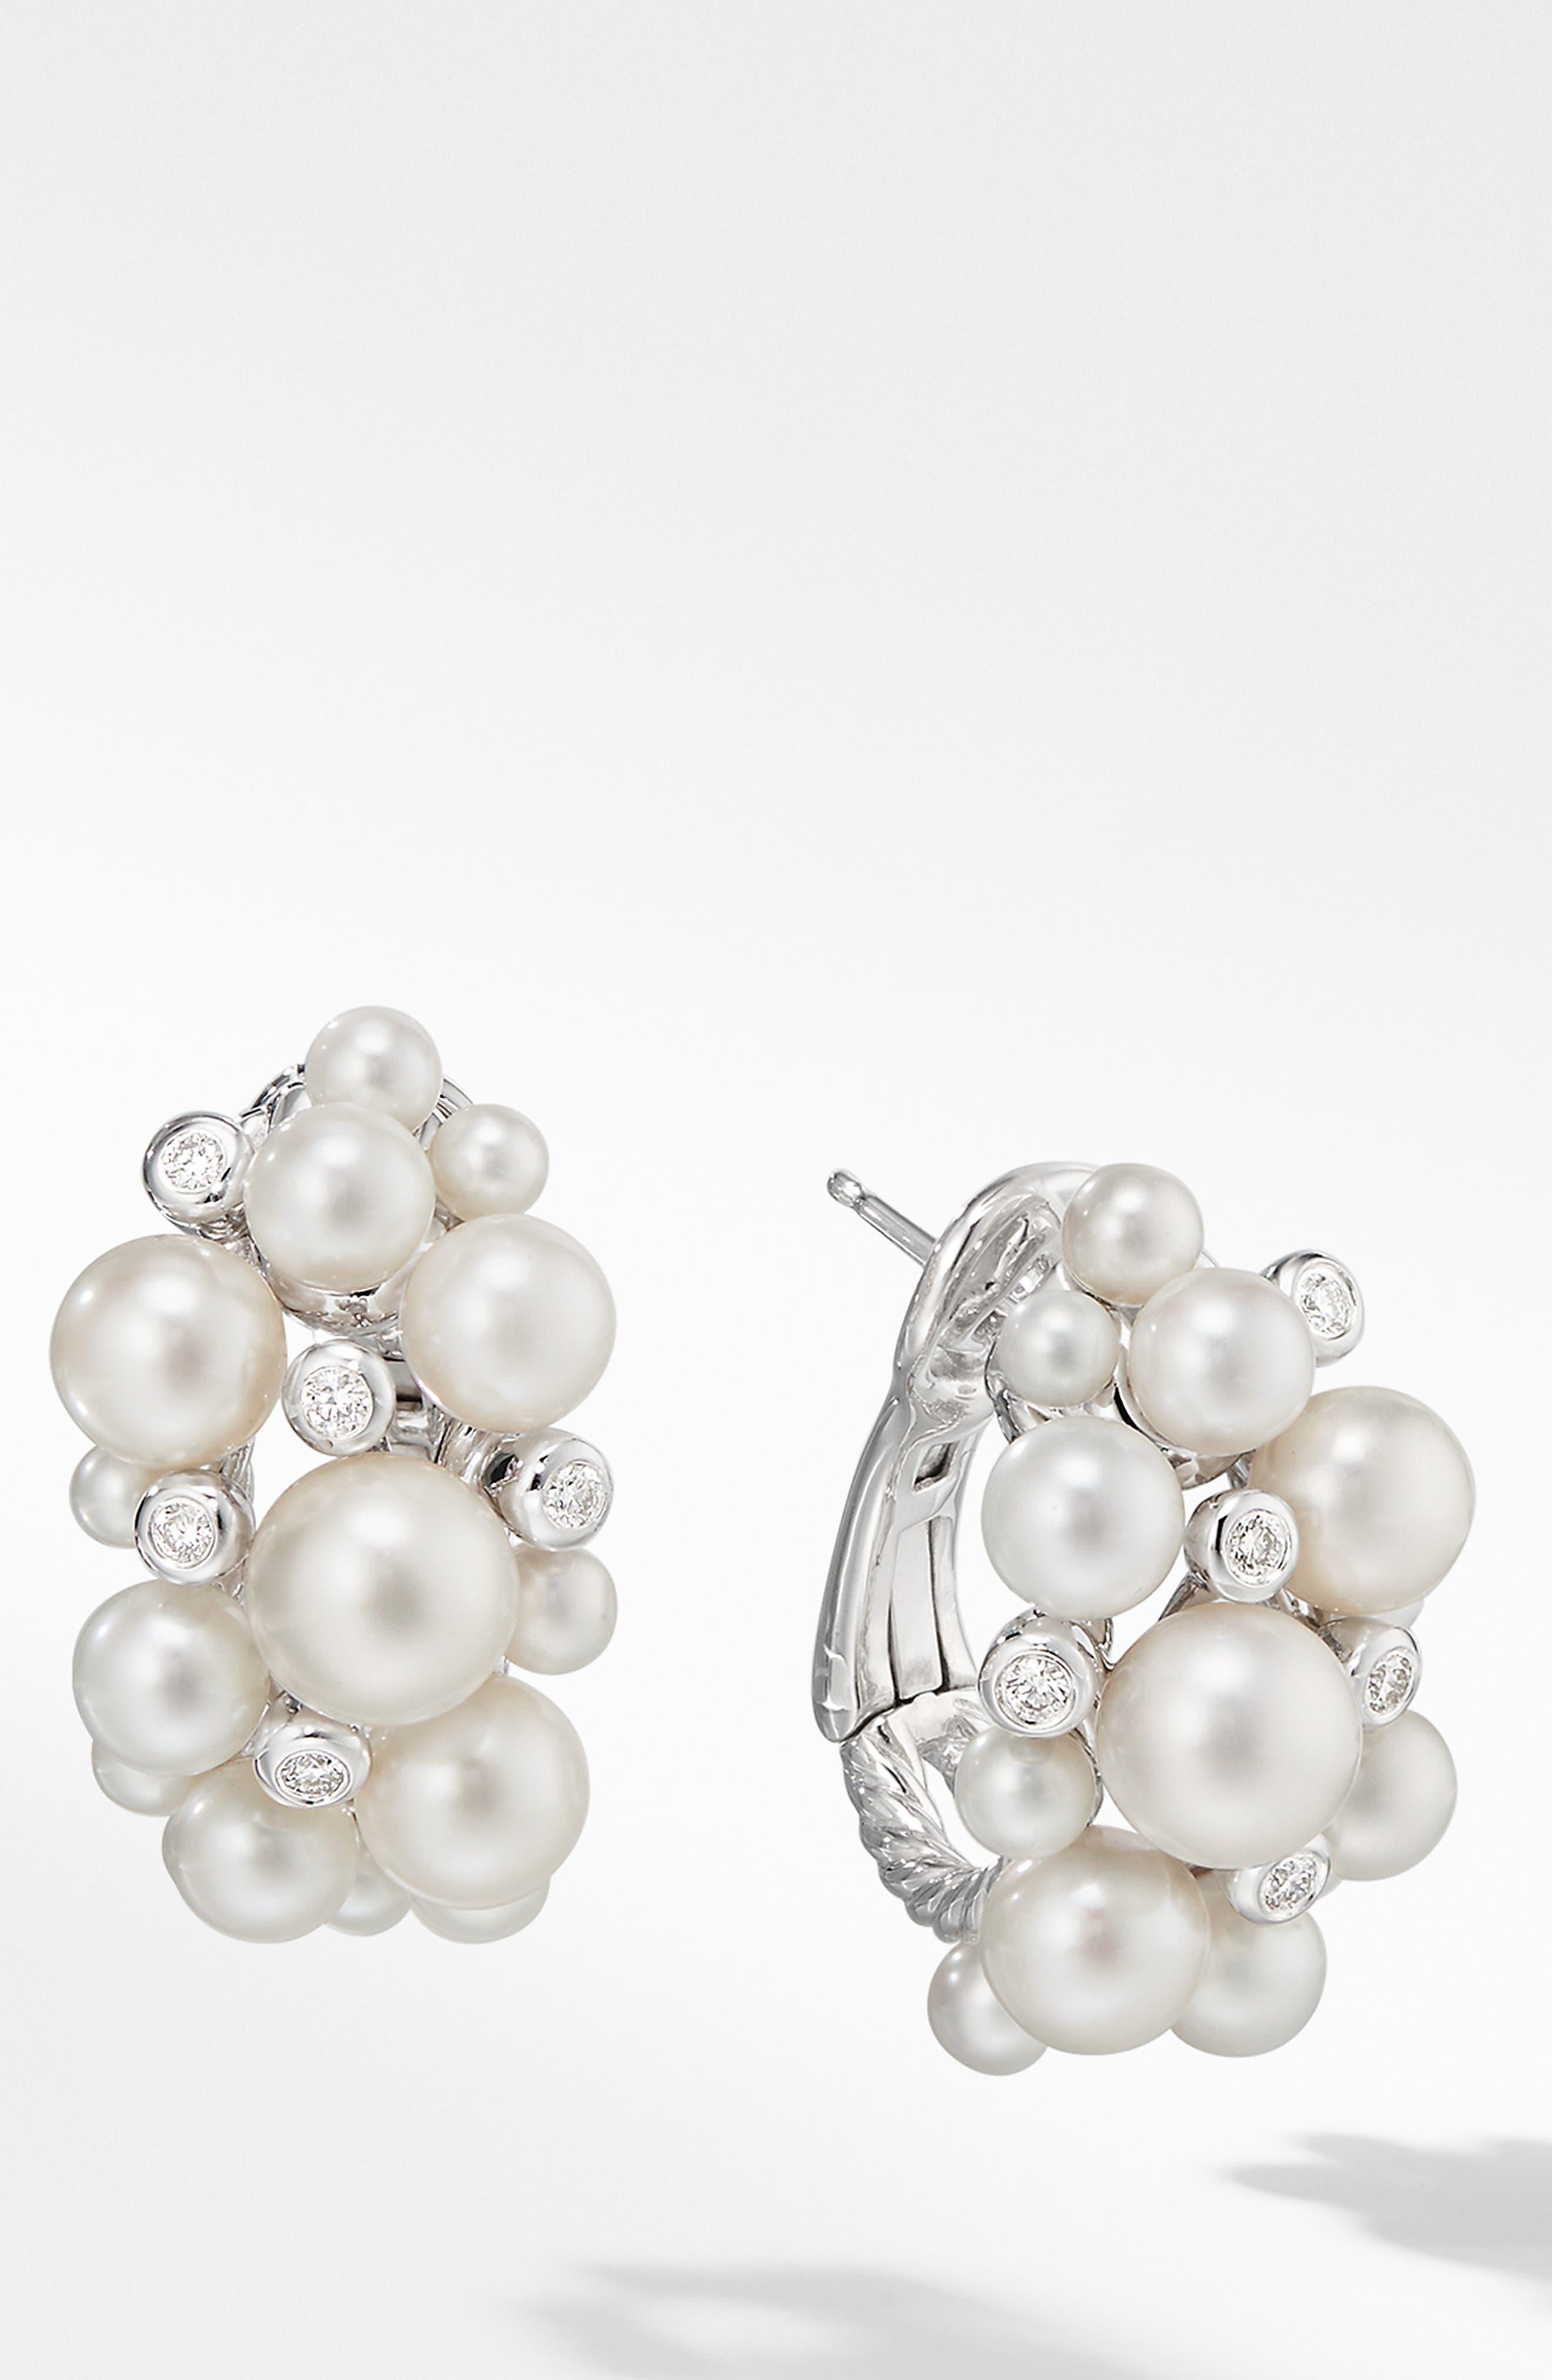 DAVID YURMAN Large Pearl Cluster Hoop Earrings with Diamonds, Main, color, PEARL